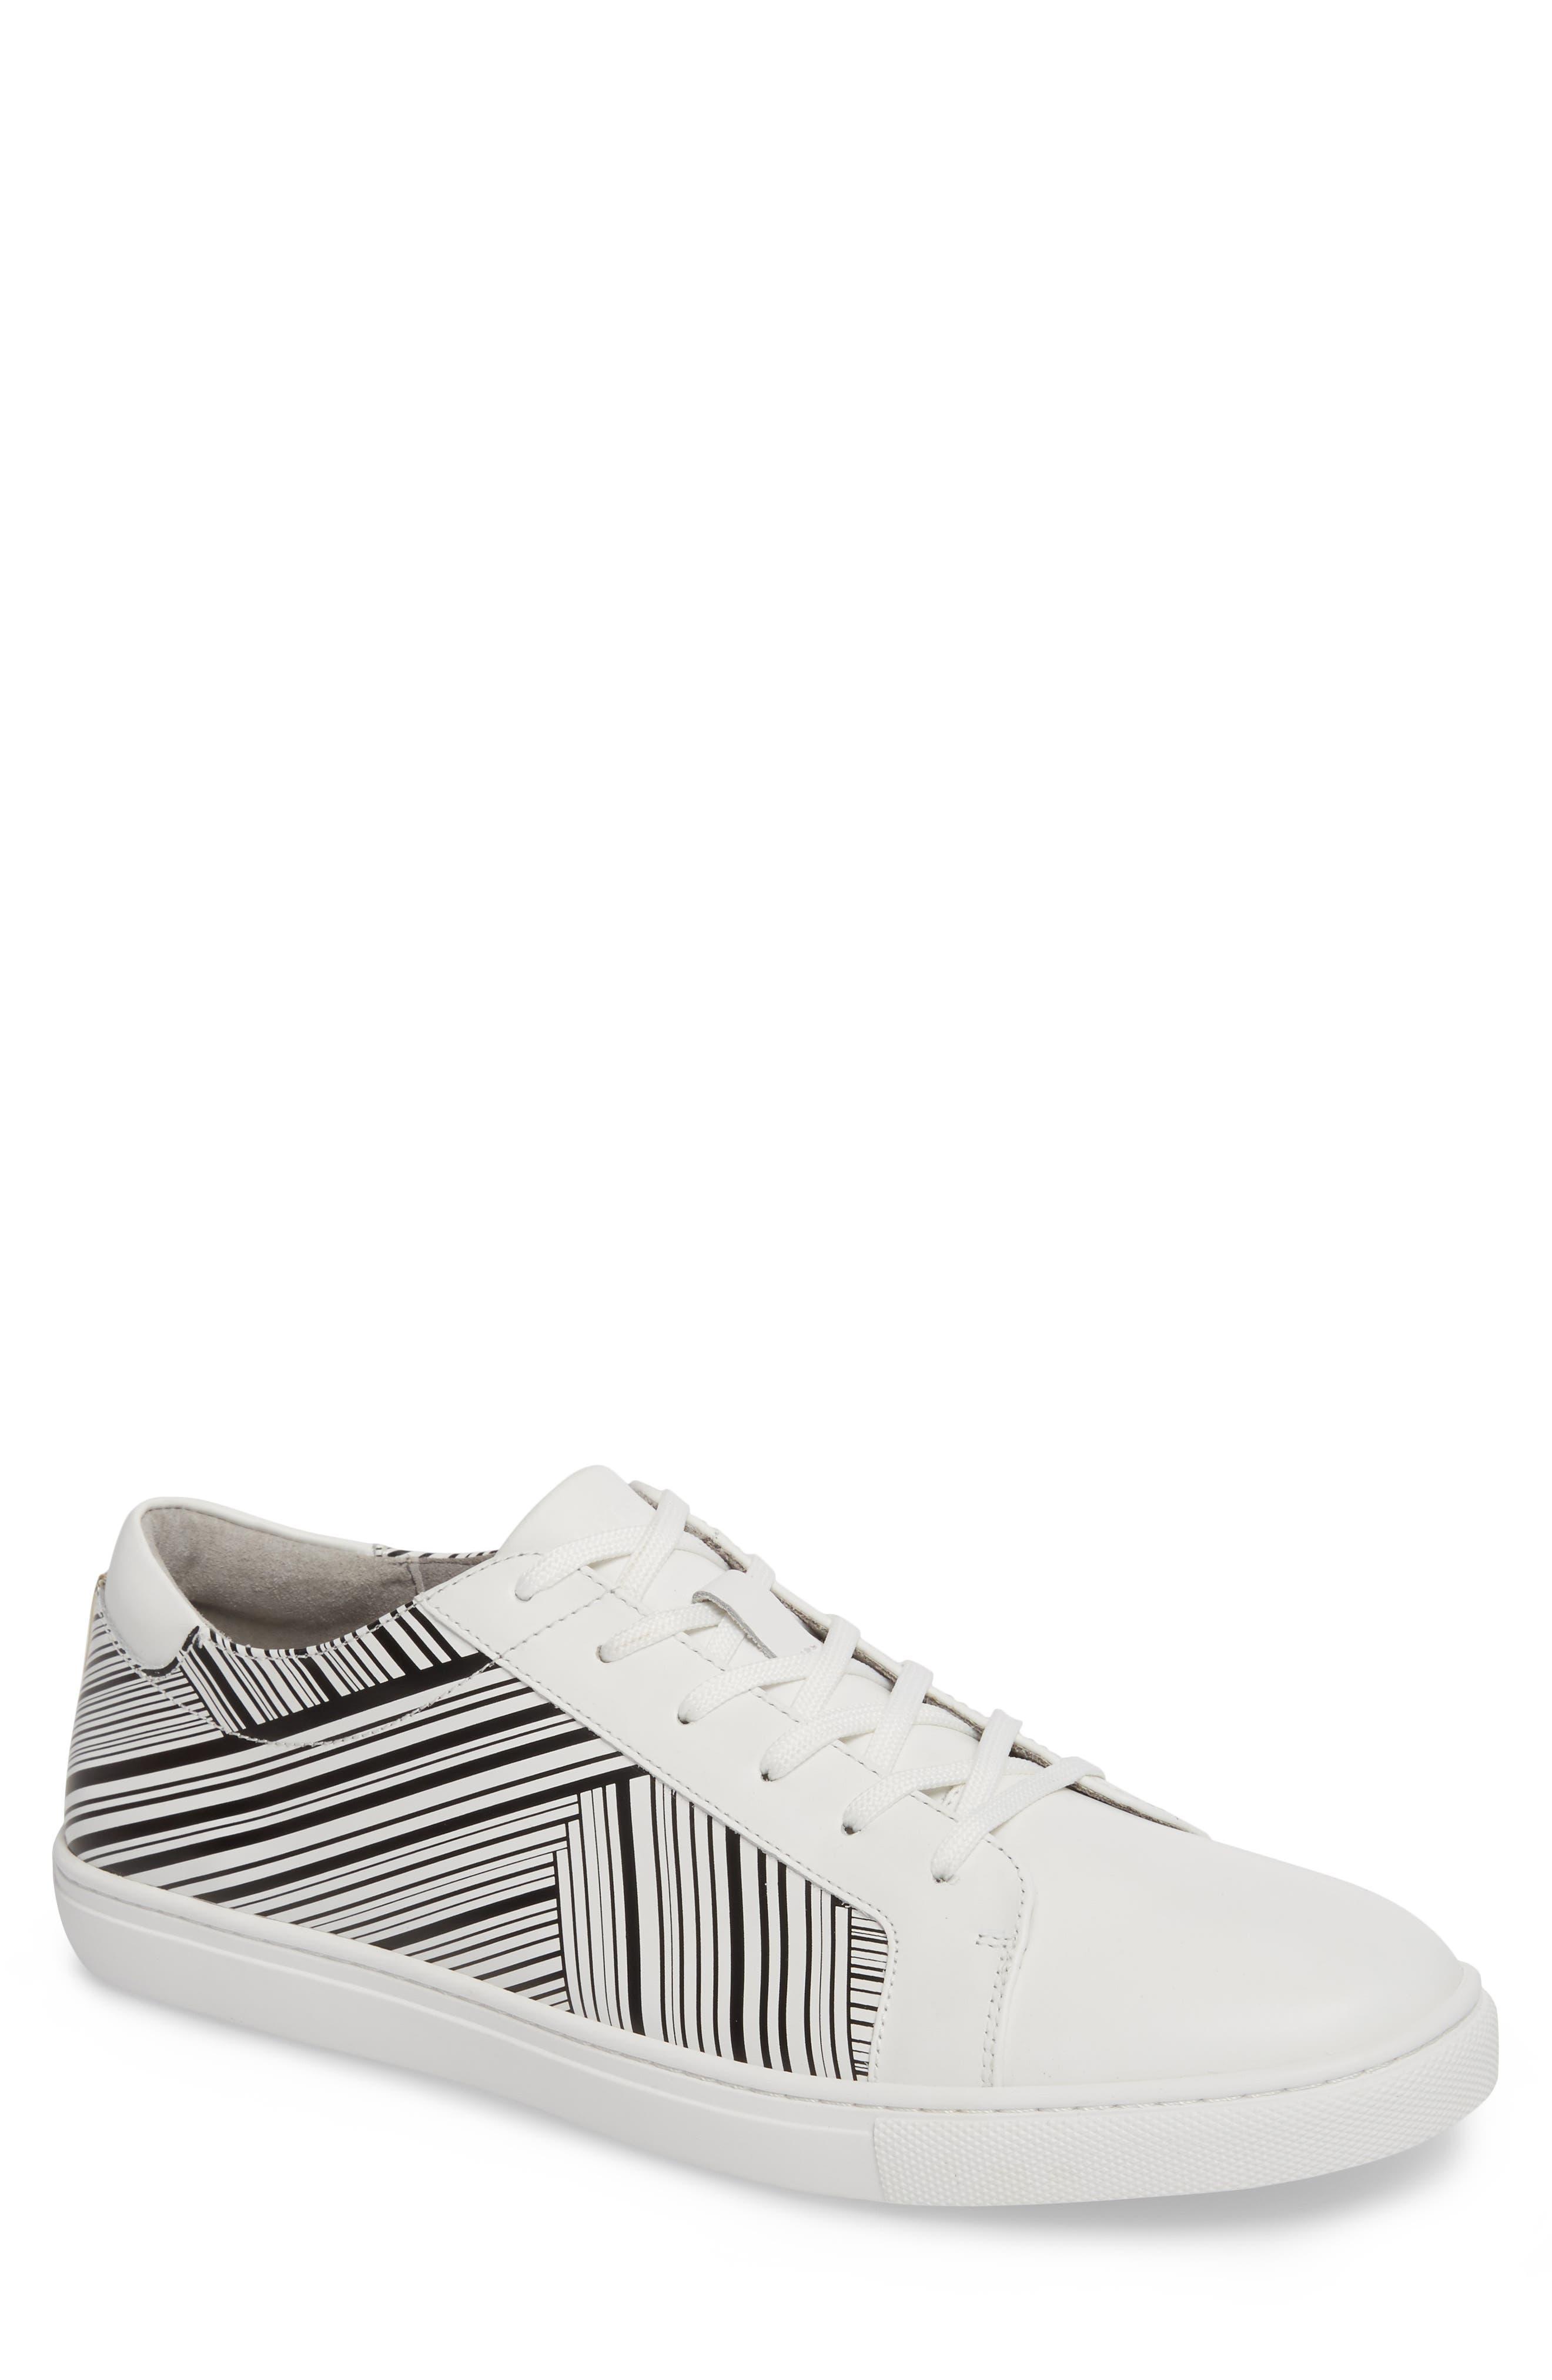 Kam Sneaker,                             Main thumbnail 1, color,                             White/ Black Leather